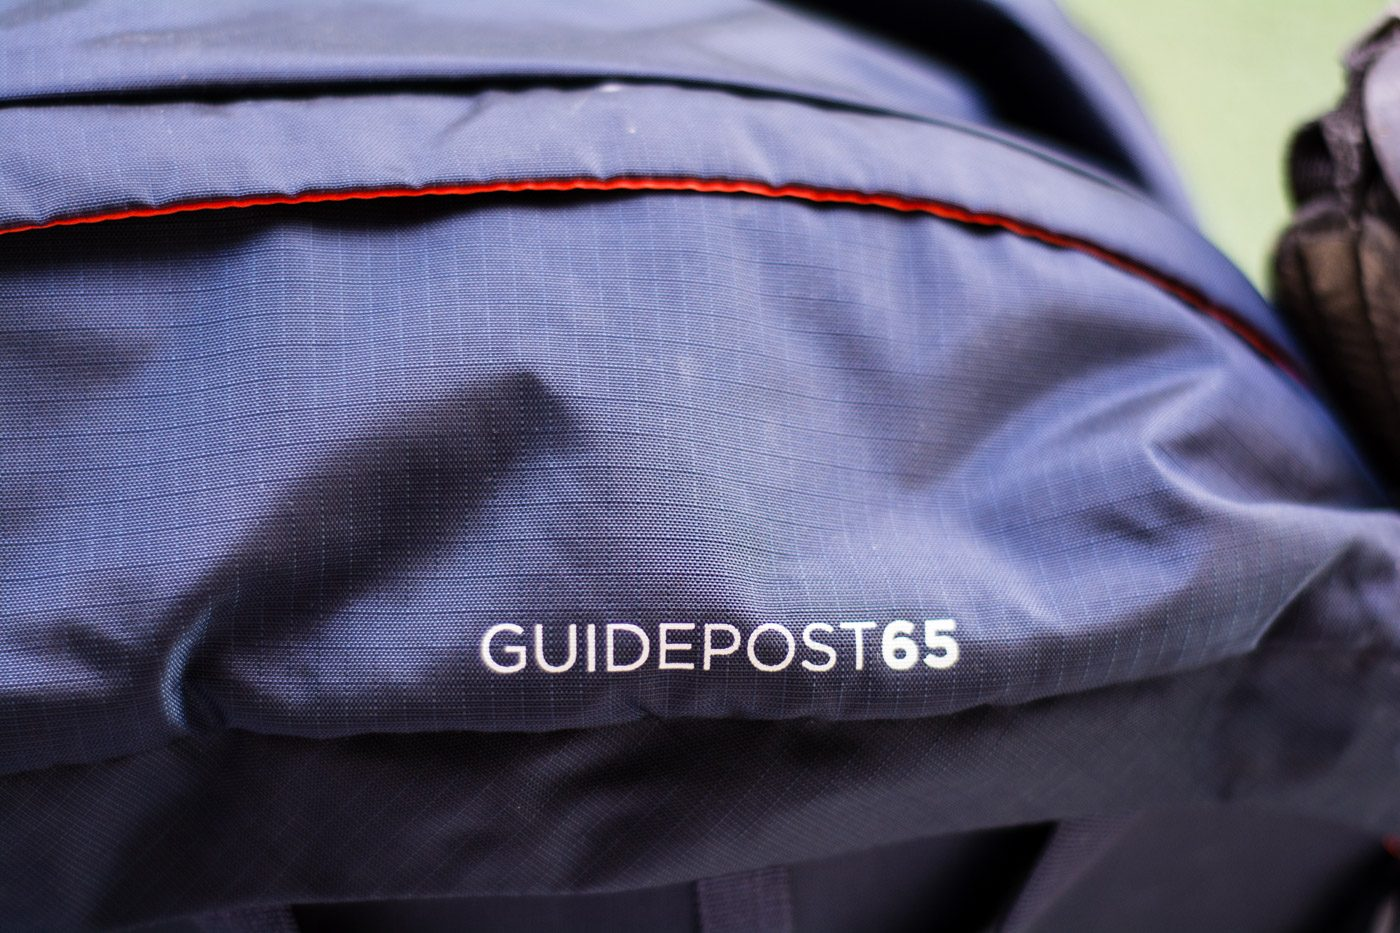 Thule Guidepost 65